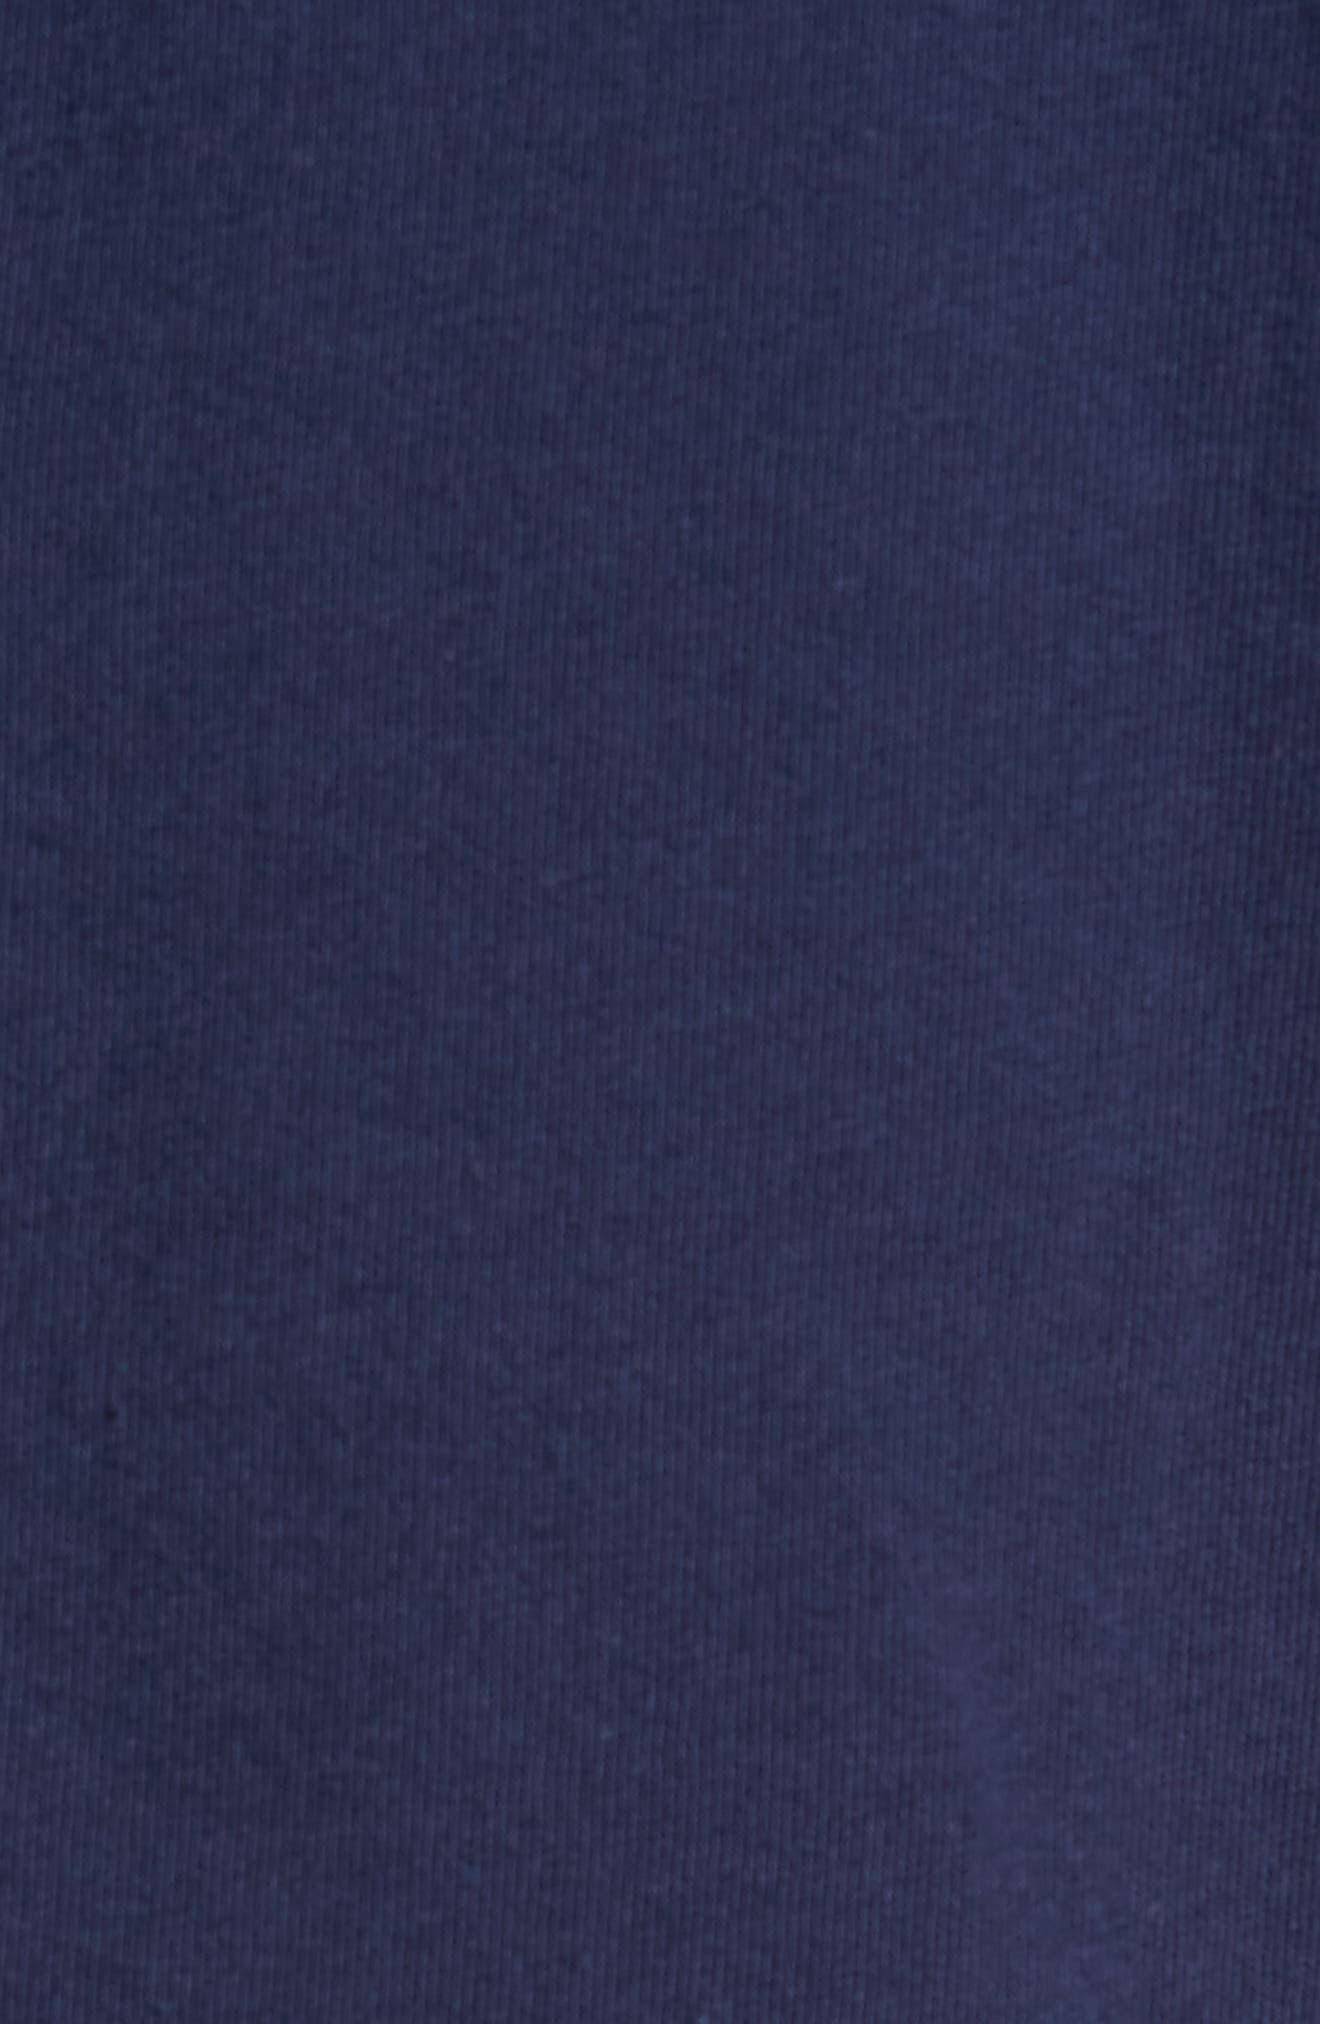 Biella Italia T-Shirt,                             Alternate thumbnail 5, color,                             Navy/ White/ Red